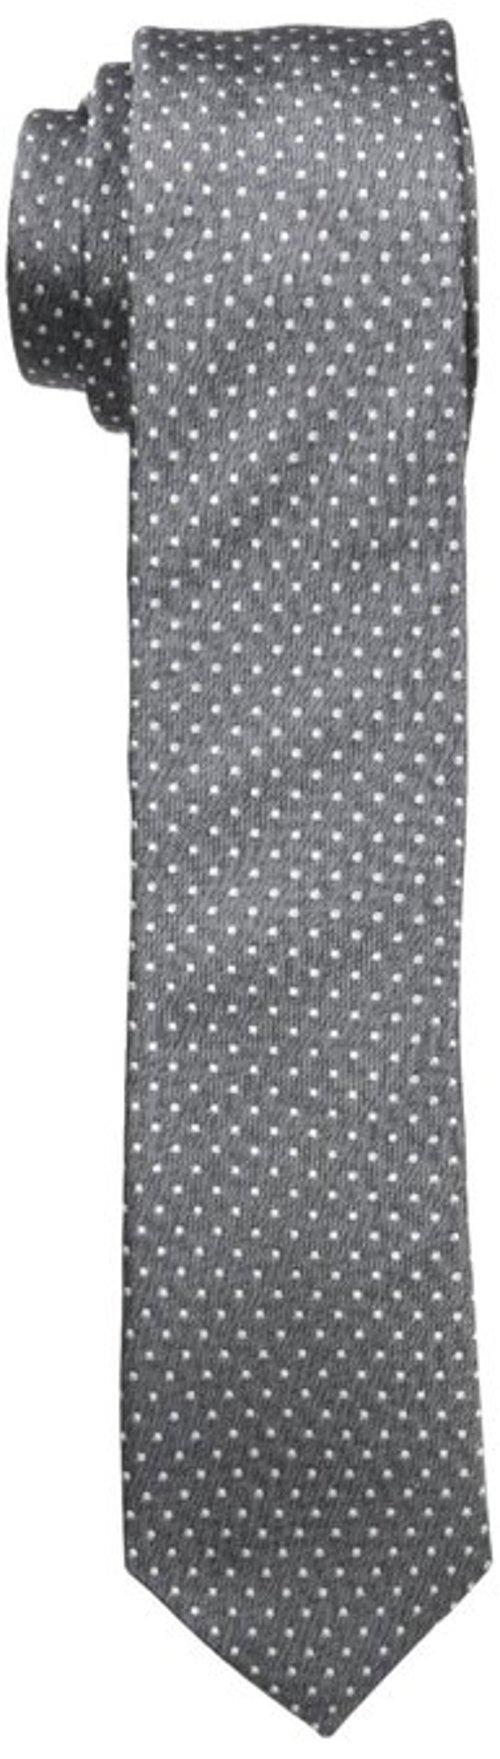 Men's Stepan Dot Tie by Original Penguin in Vice